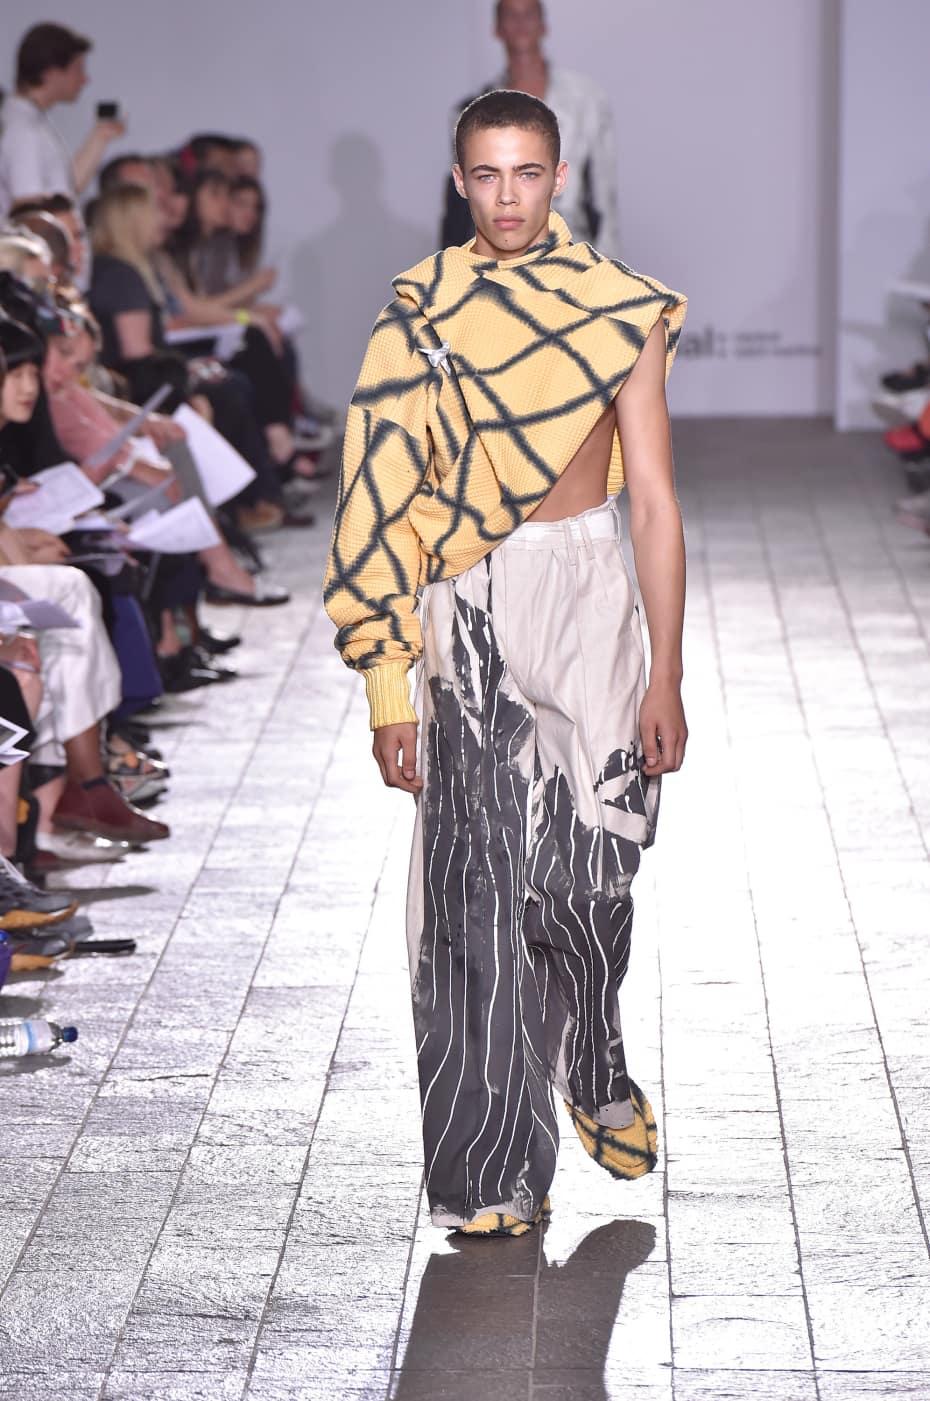 BA (Hons) Fashion - Central Saint Martins - UAL